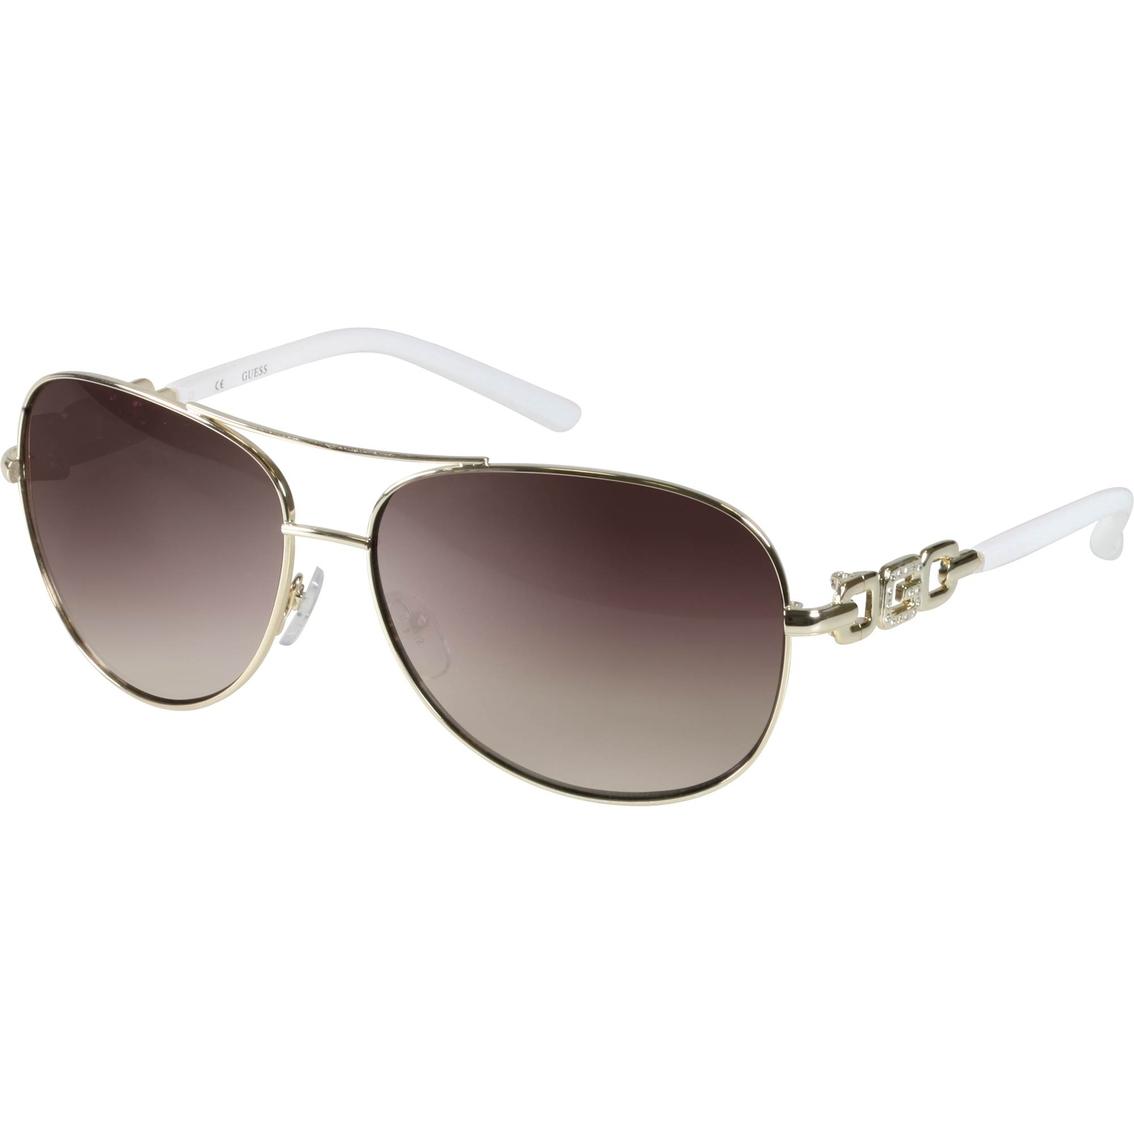 american aviator sunglasses iidi  american aviator sunglasses